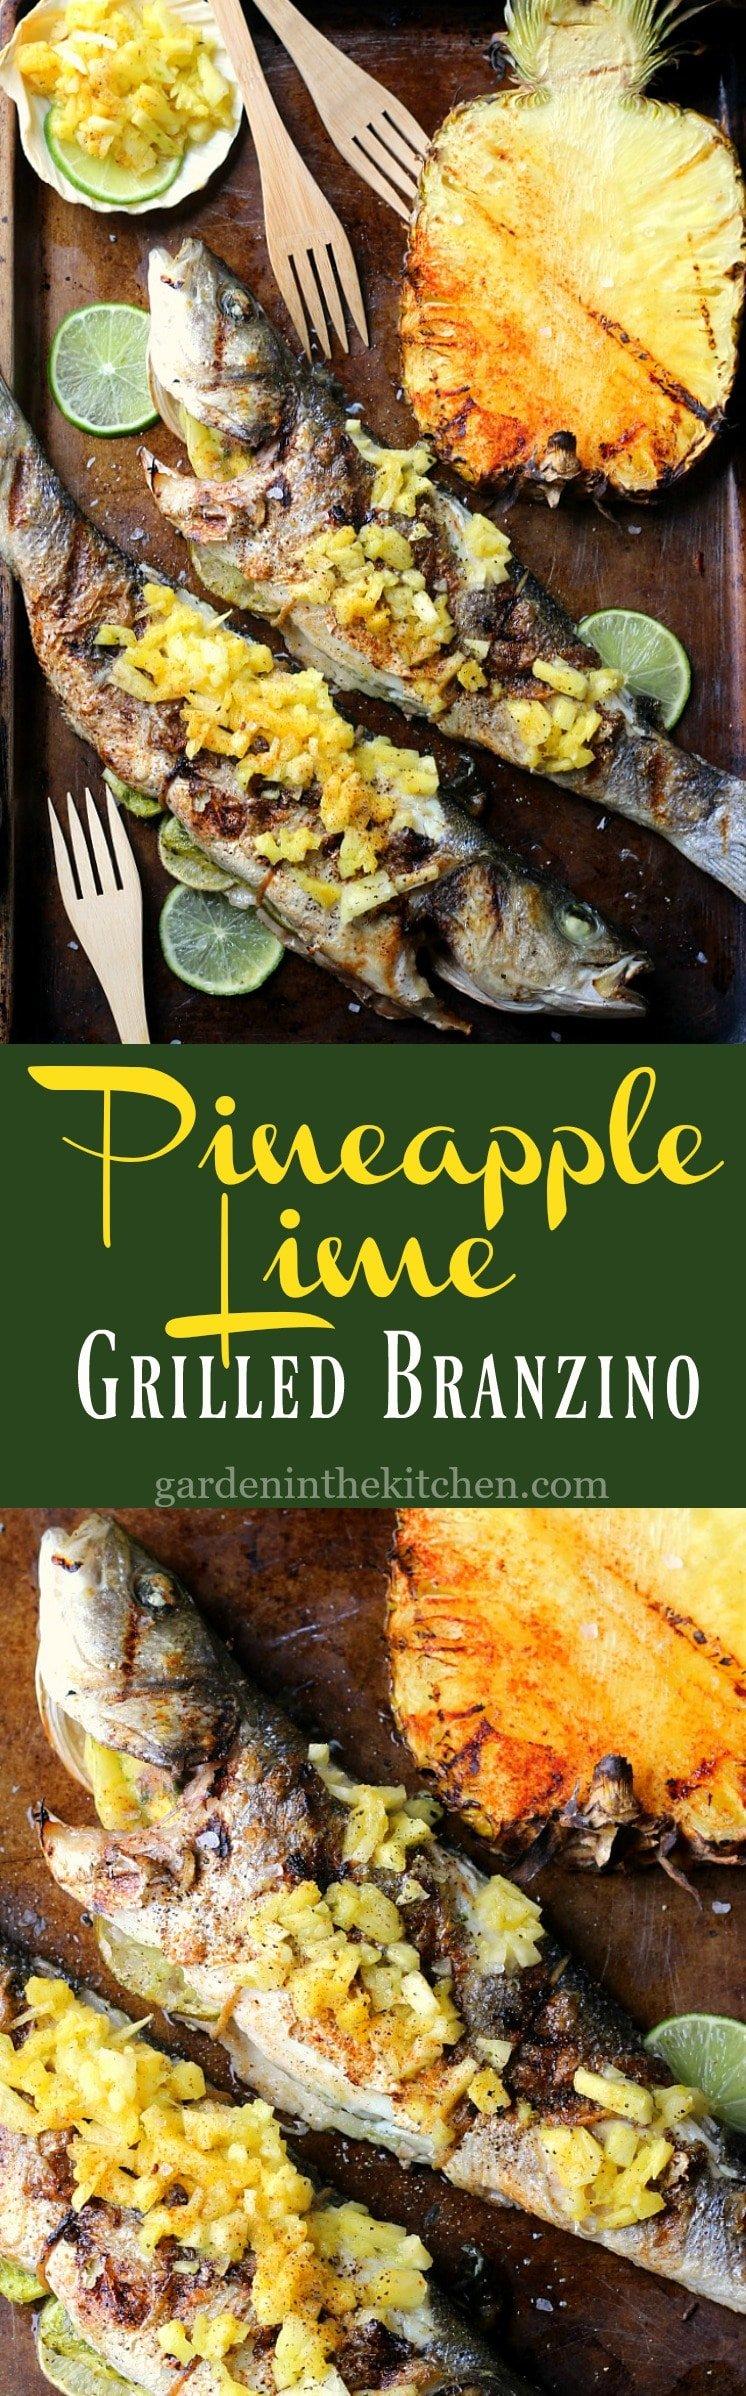 Pineapple Lime Grilled Branzino